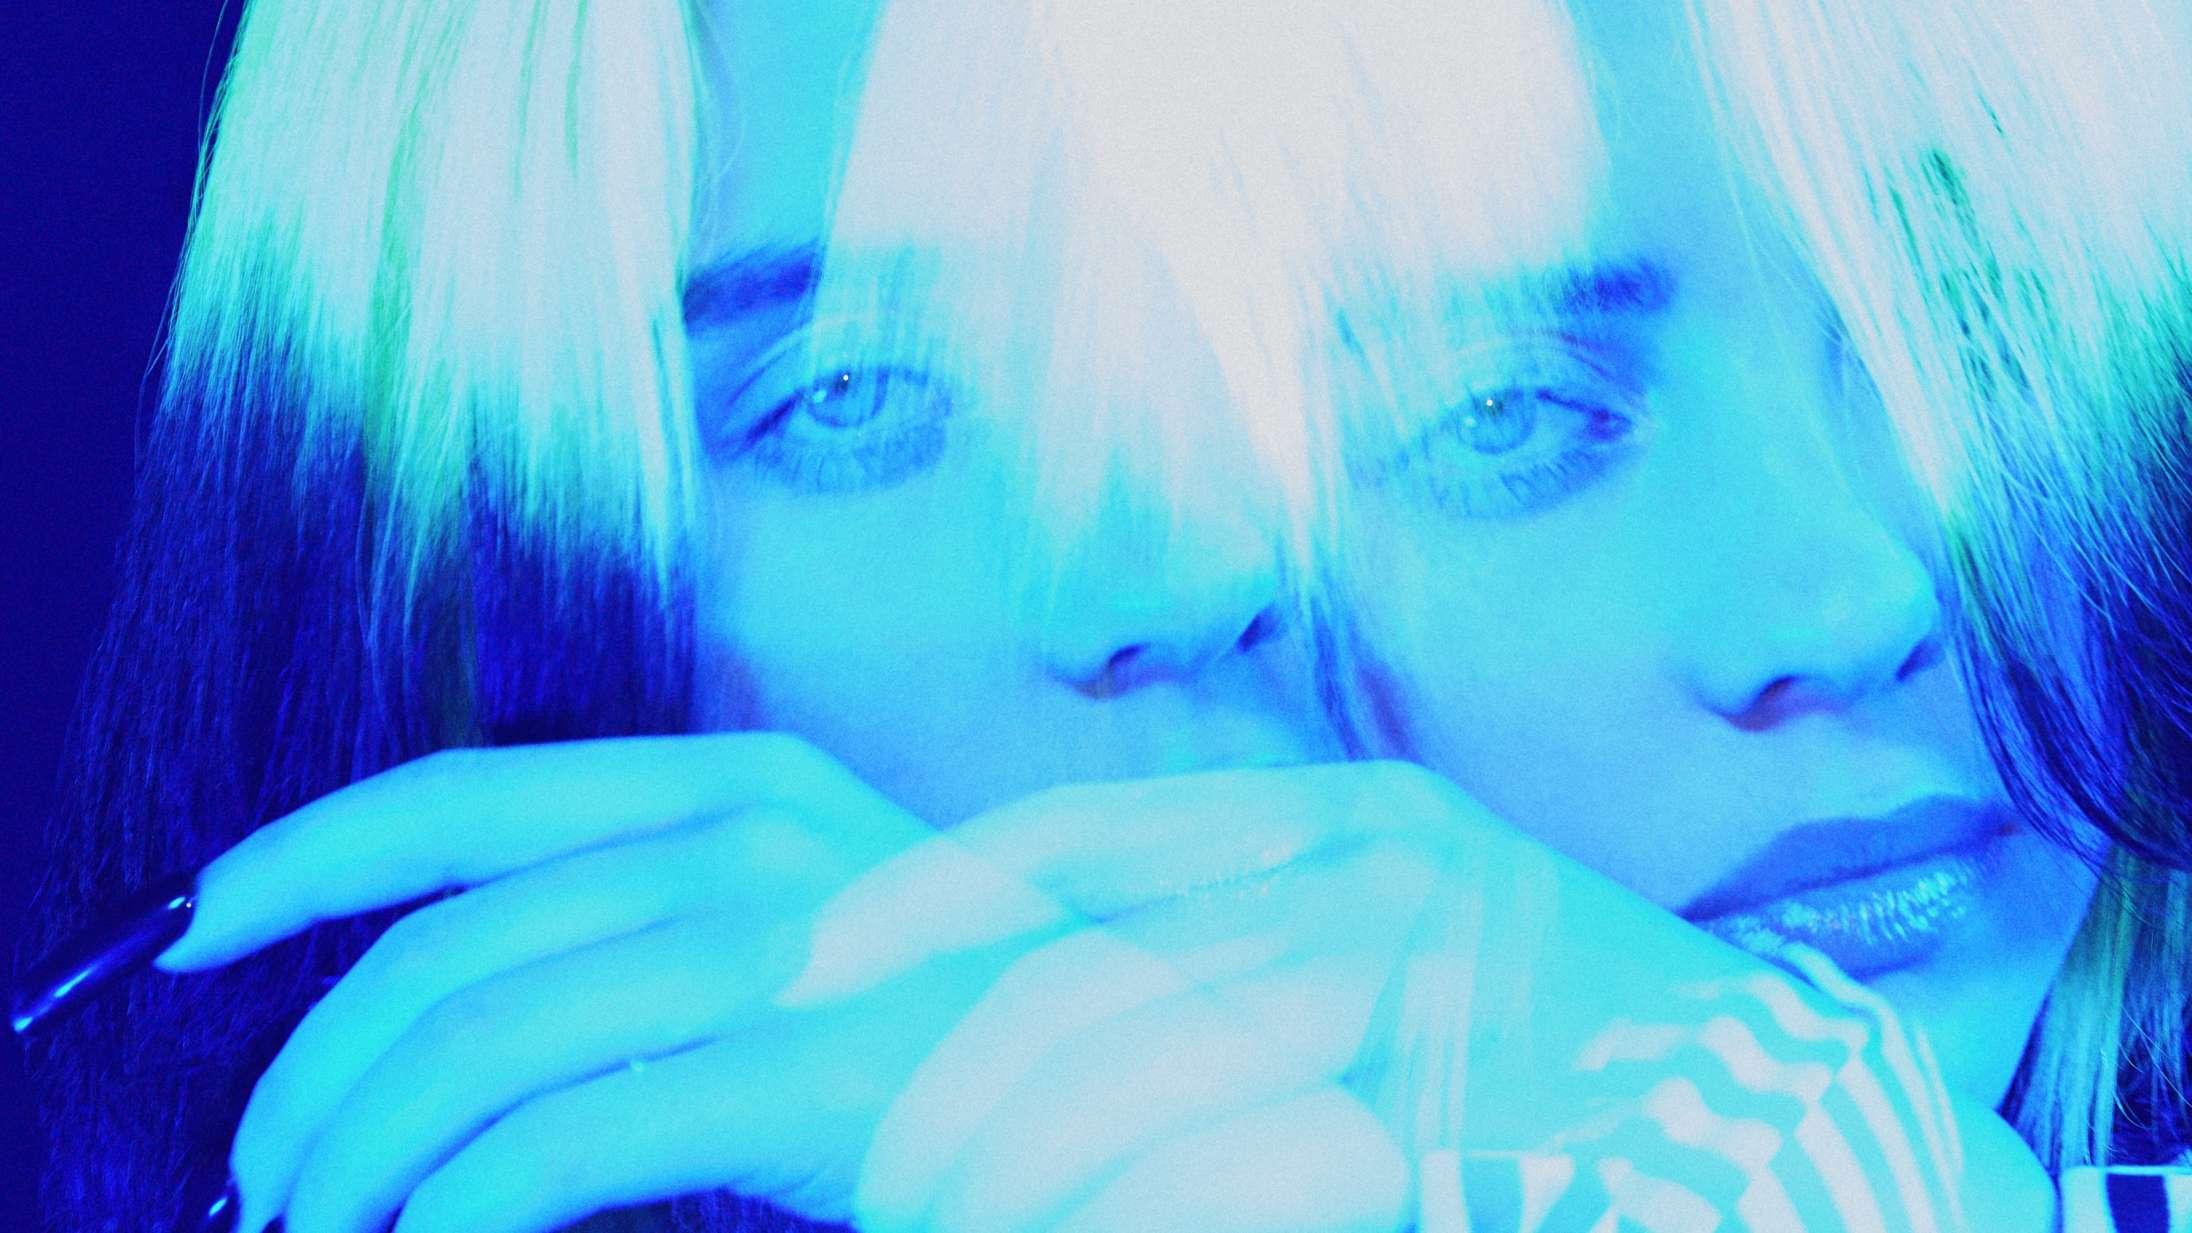 Kom tæt på Billie Eilish i ny dokumentar – se teaser